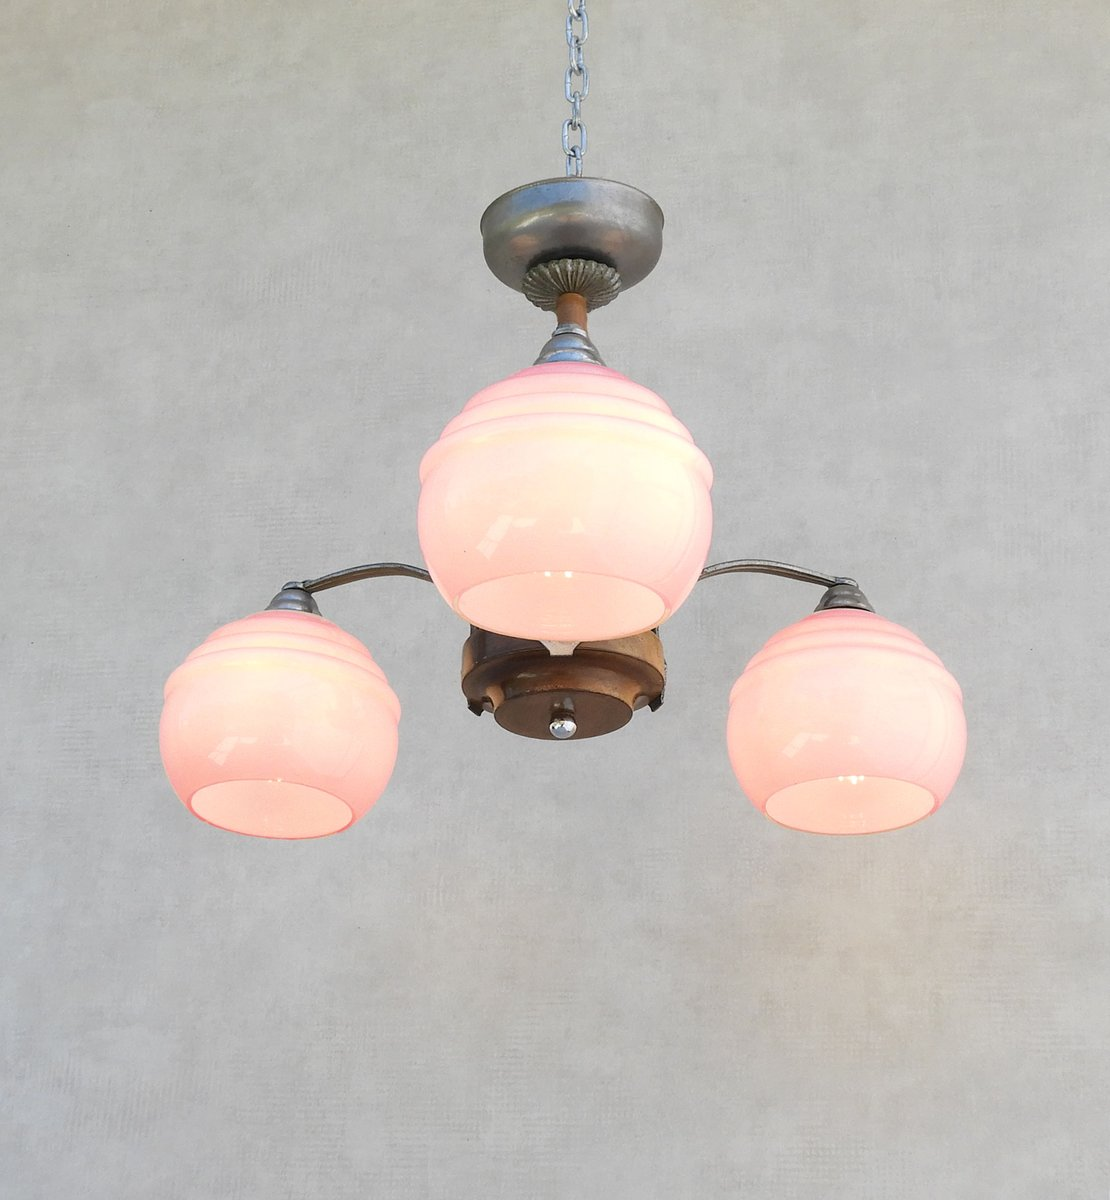 plafonnier art d co en verre opalin rose 1930s en vente. Black Bedroom Furniture Sets. Home Design Ideas